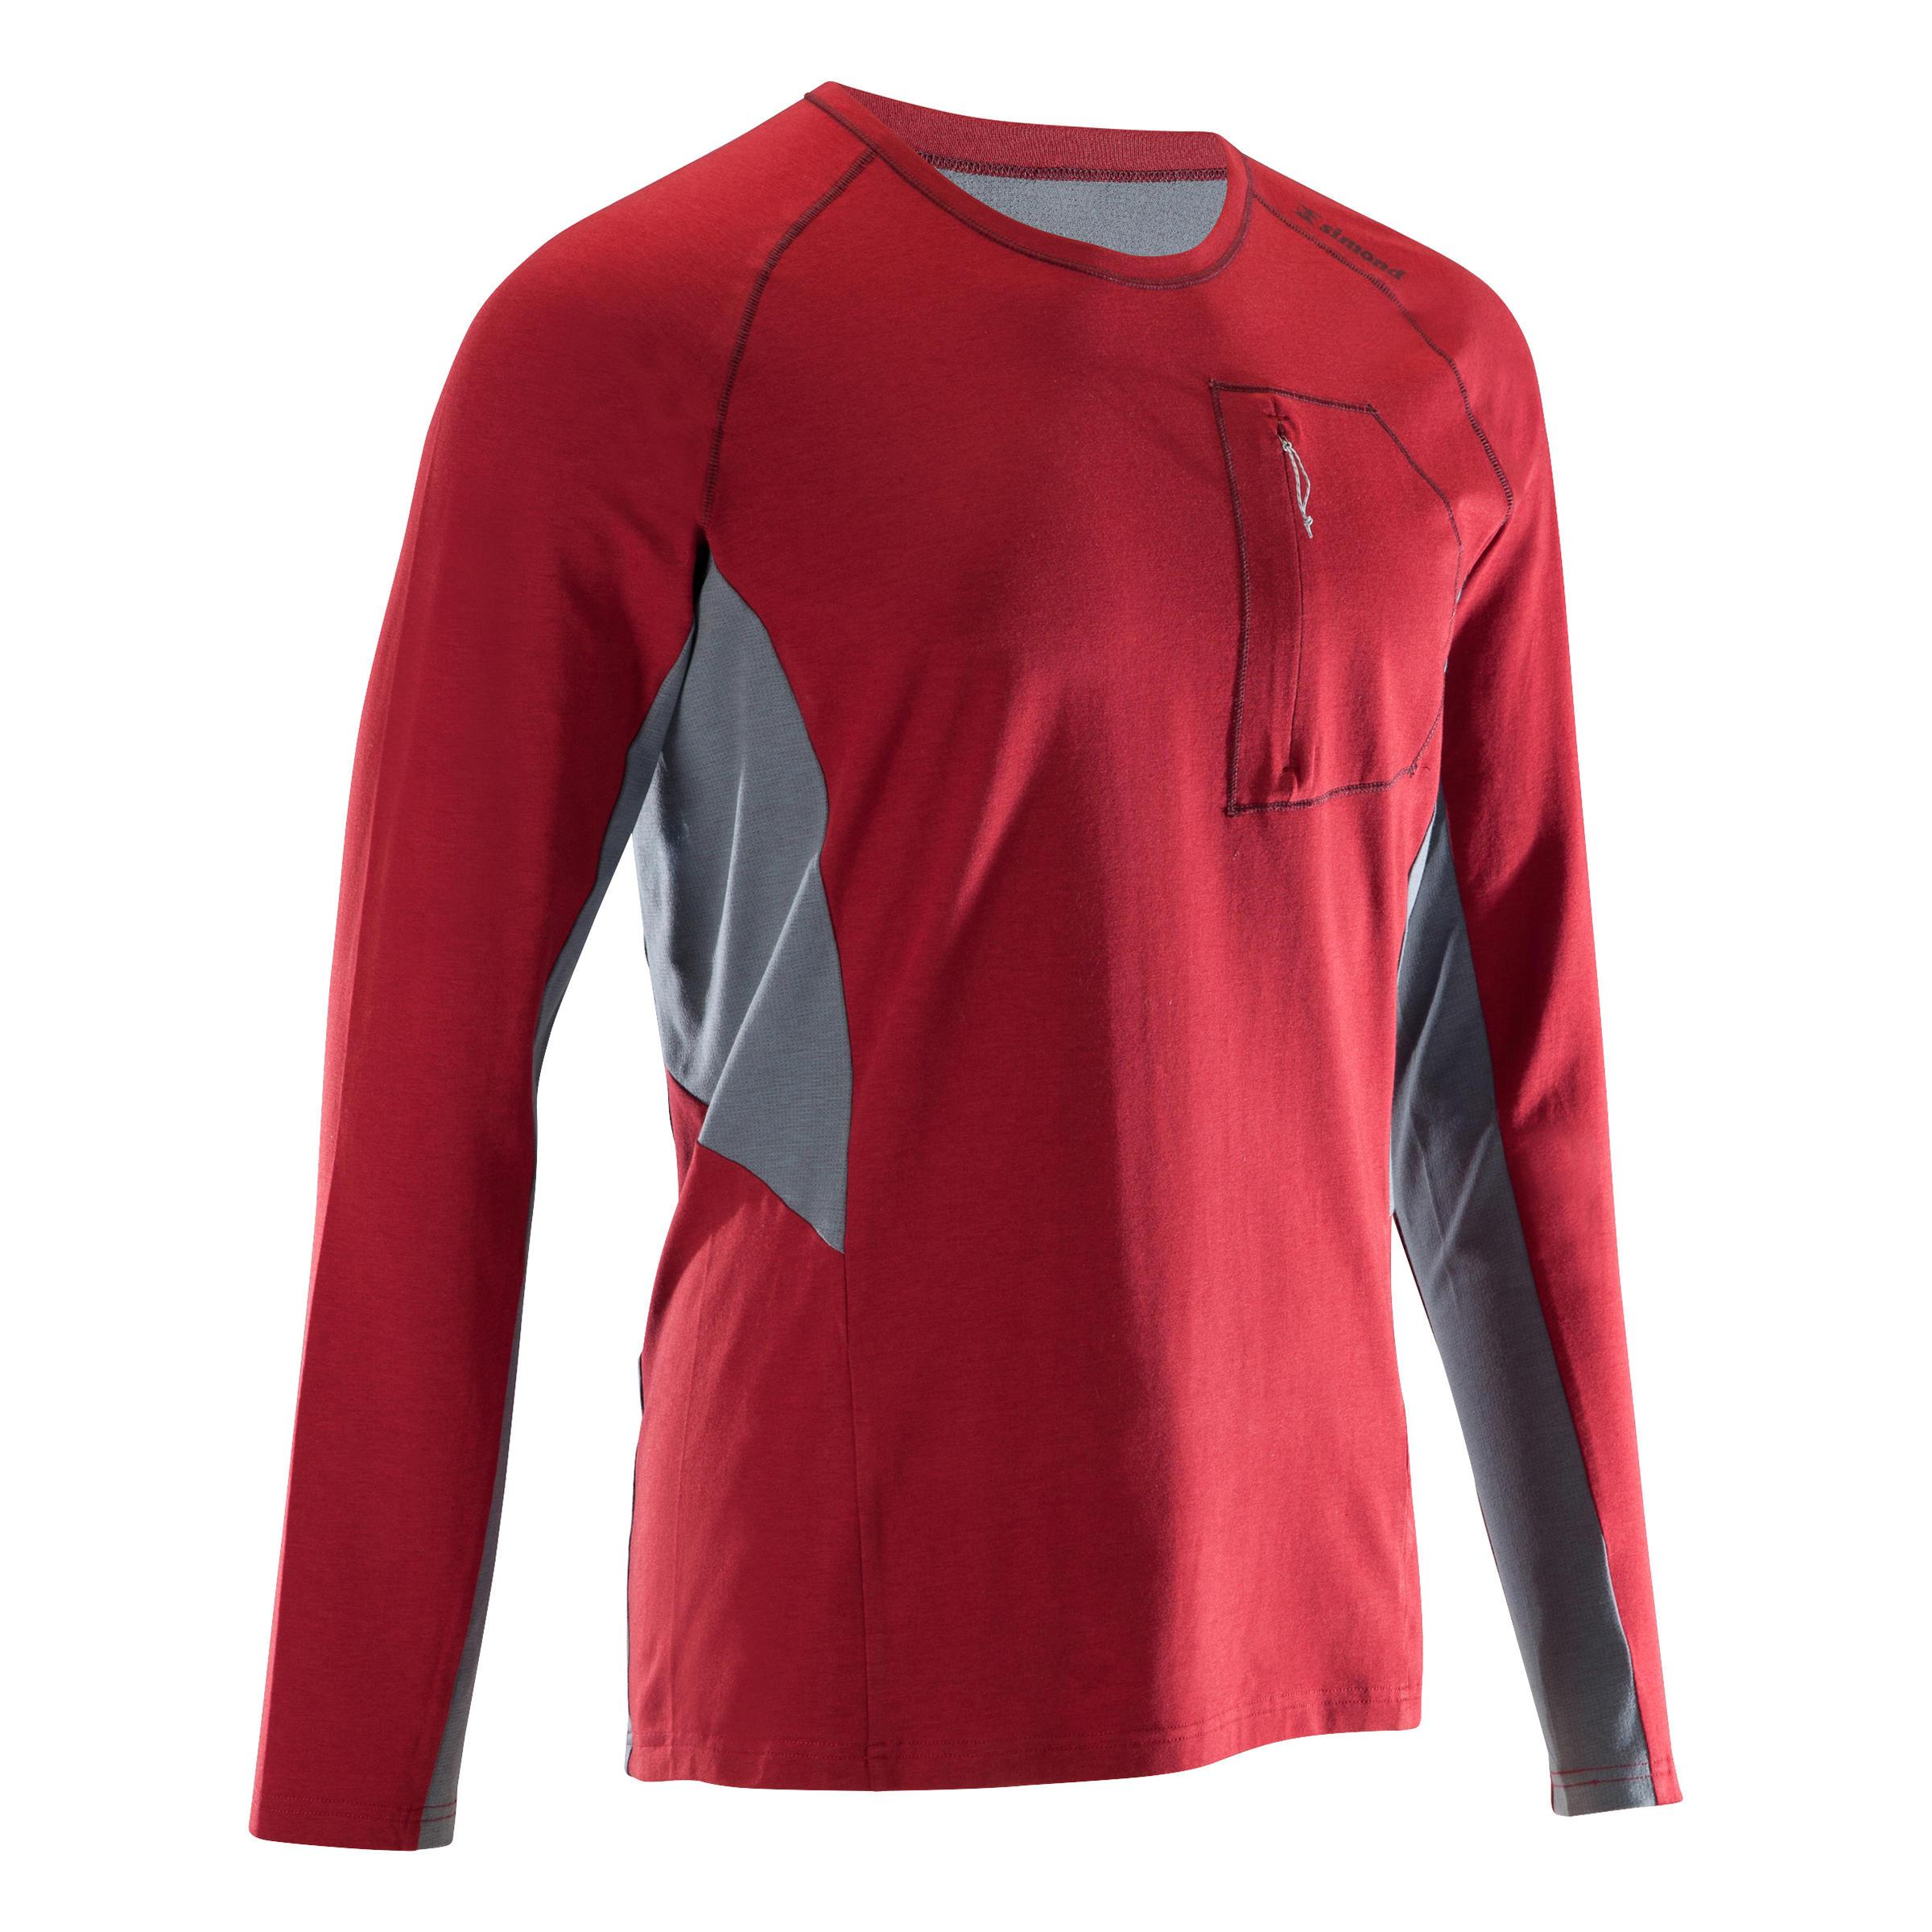 Klettershirt langarm Stretch Herren bordeaux | Sportbekleidung > Sportshirts > Klettershirts | Simond